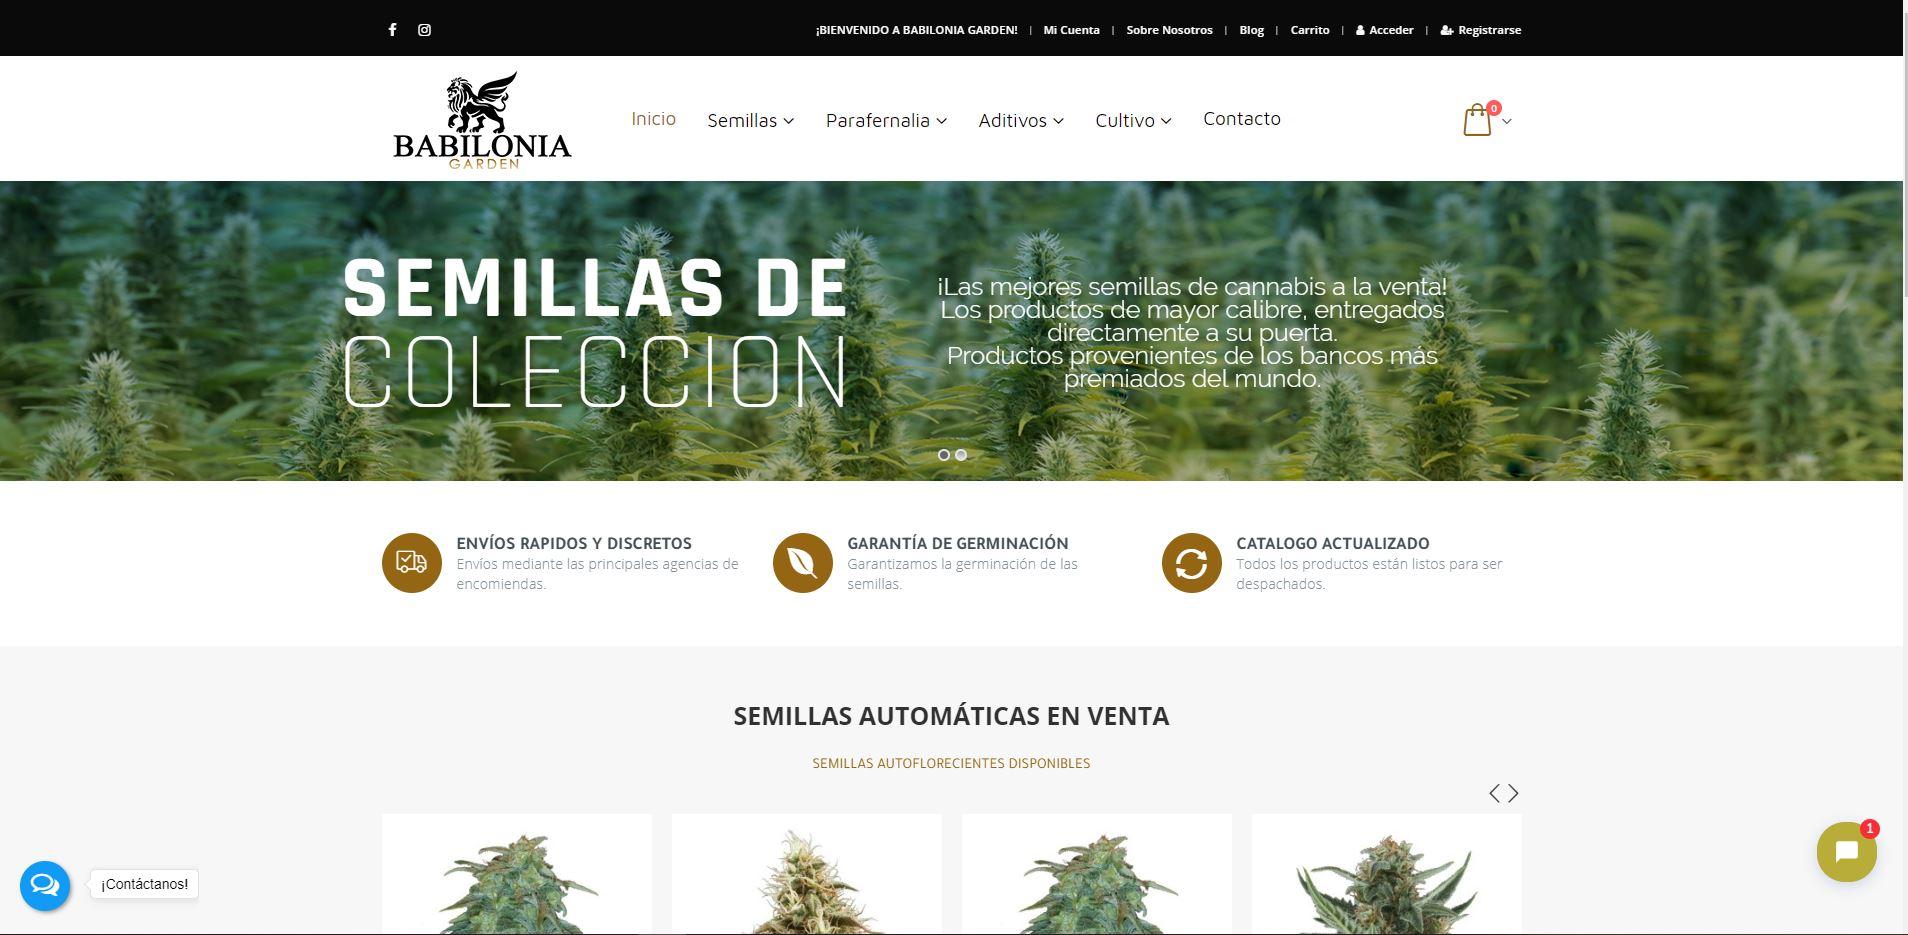 Babiloniagarden.cl - Tiweb - Pagina Web Autoadministrable - Posicionamiento Web